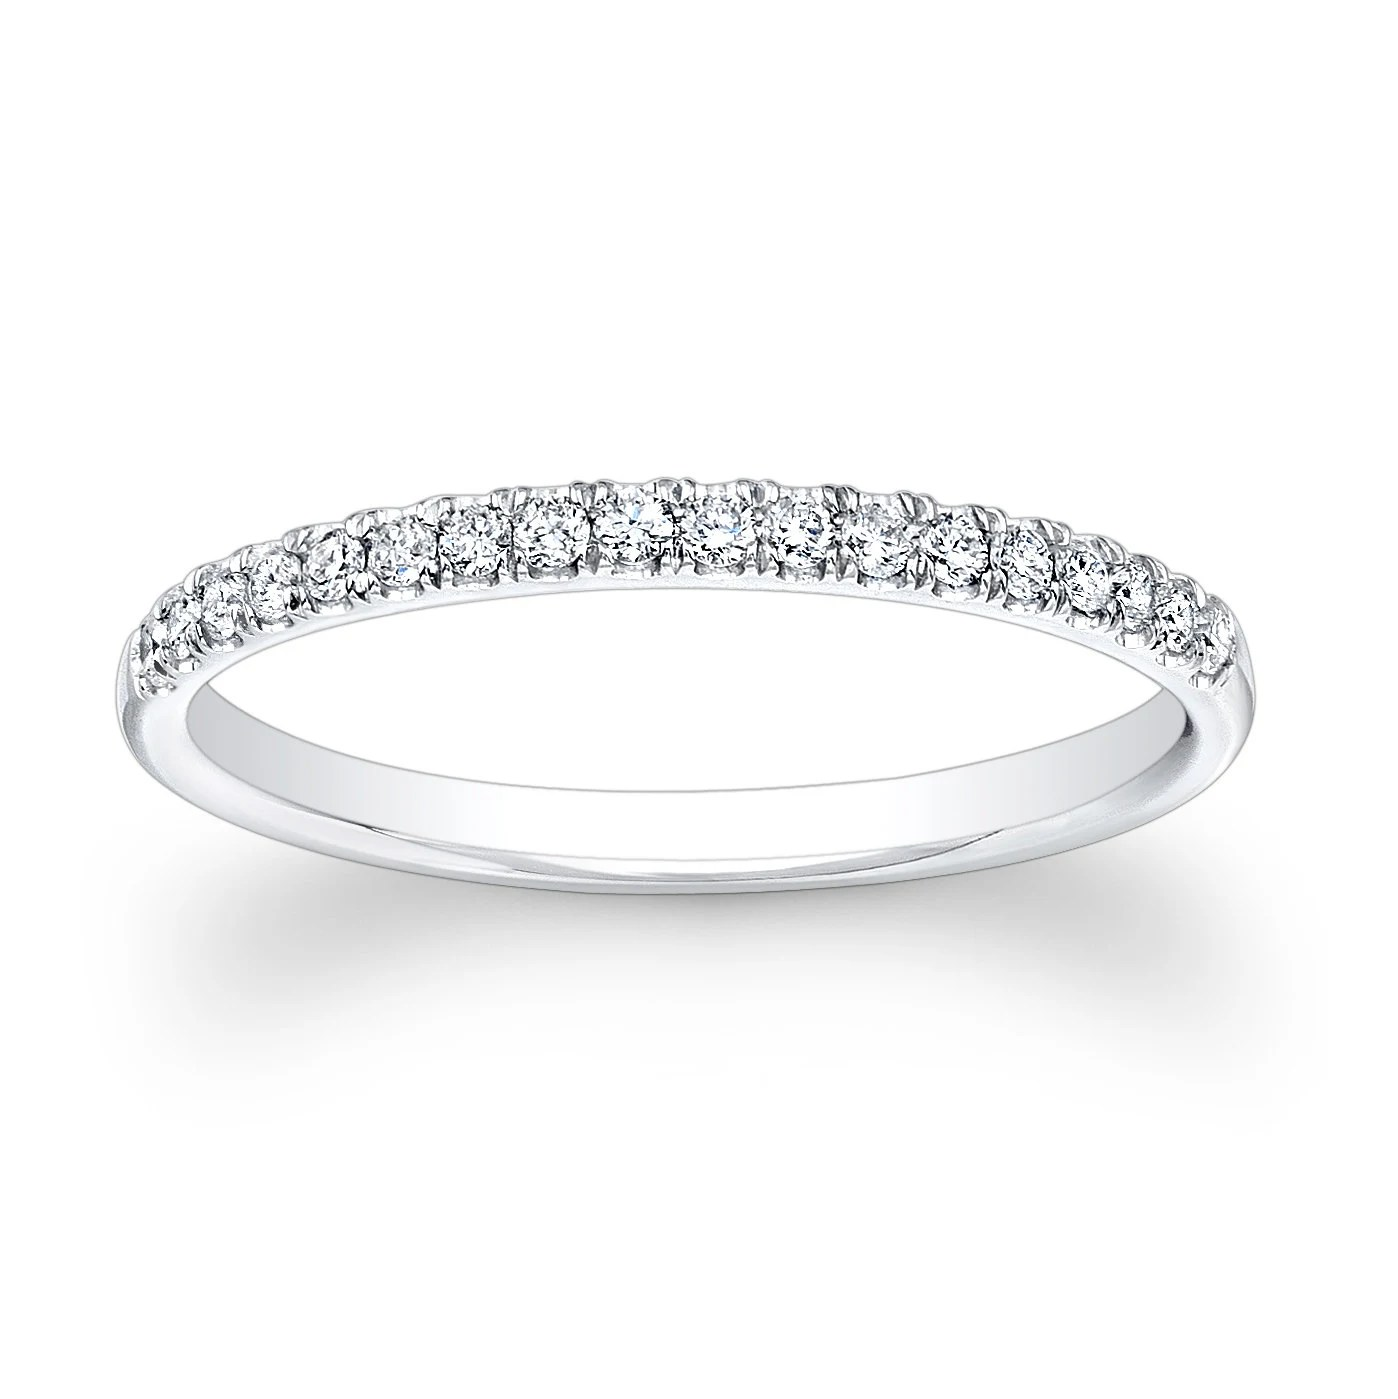 pave diamond band platinum diamond wedding bands Ladies 18kt white gold diamond wedding band 0 20 ctw G VS2 diamonds